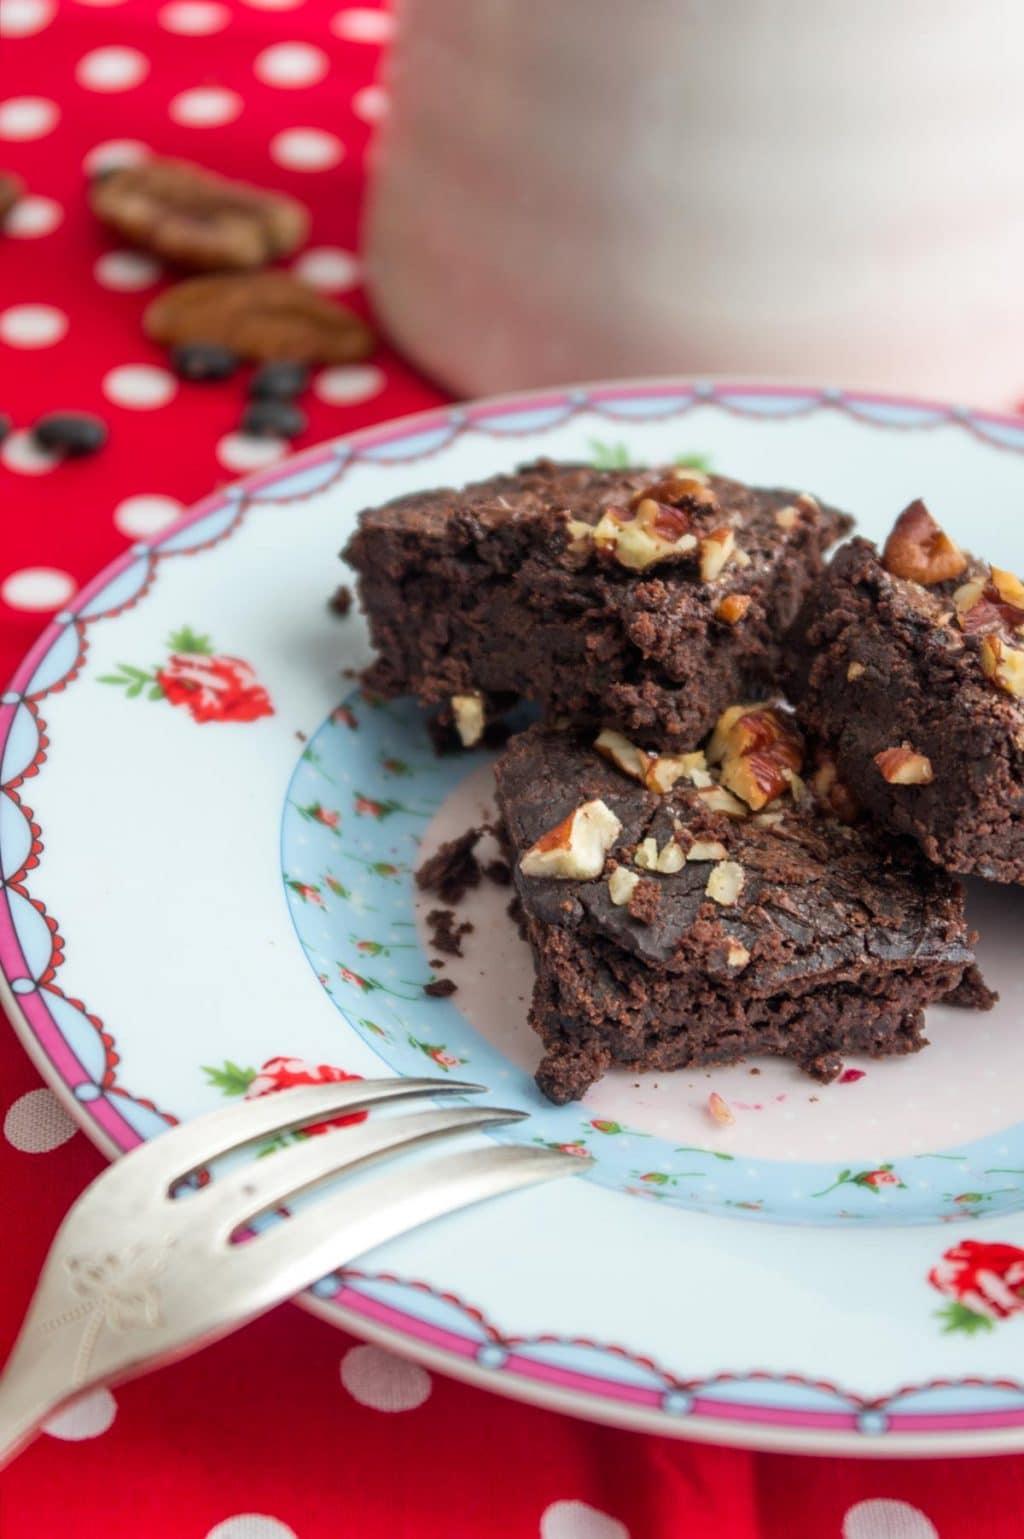 Black Bean Brownies - super lecker, kalorienarm, schokoladig, saftig, unglaublich lecker.